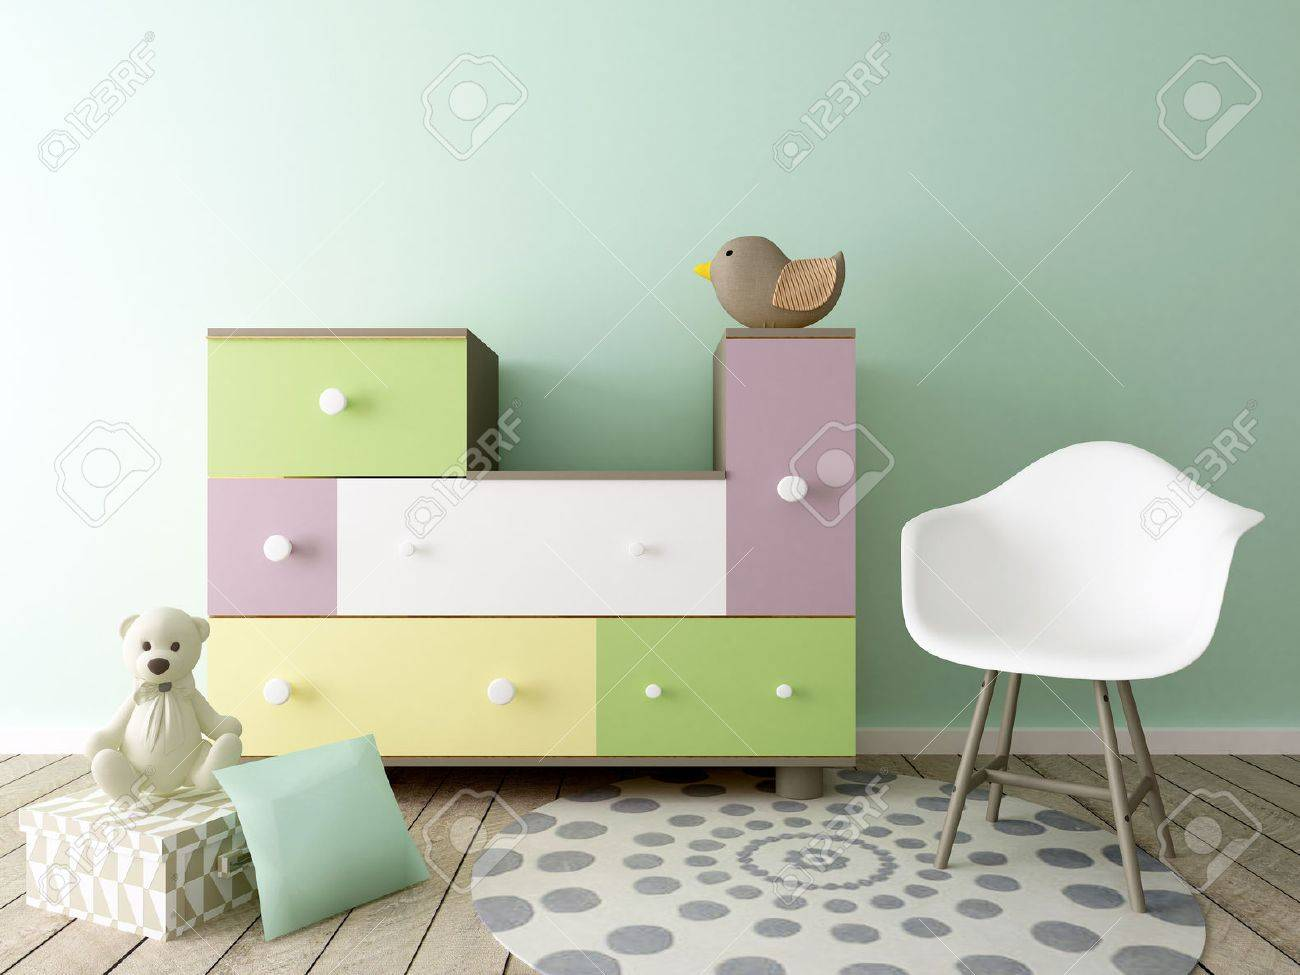 baby room, nursery interior - 51915995